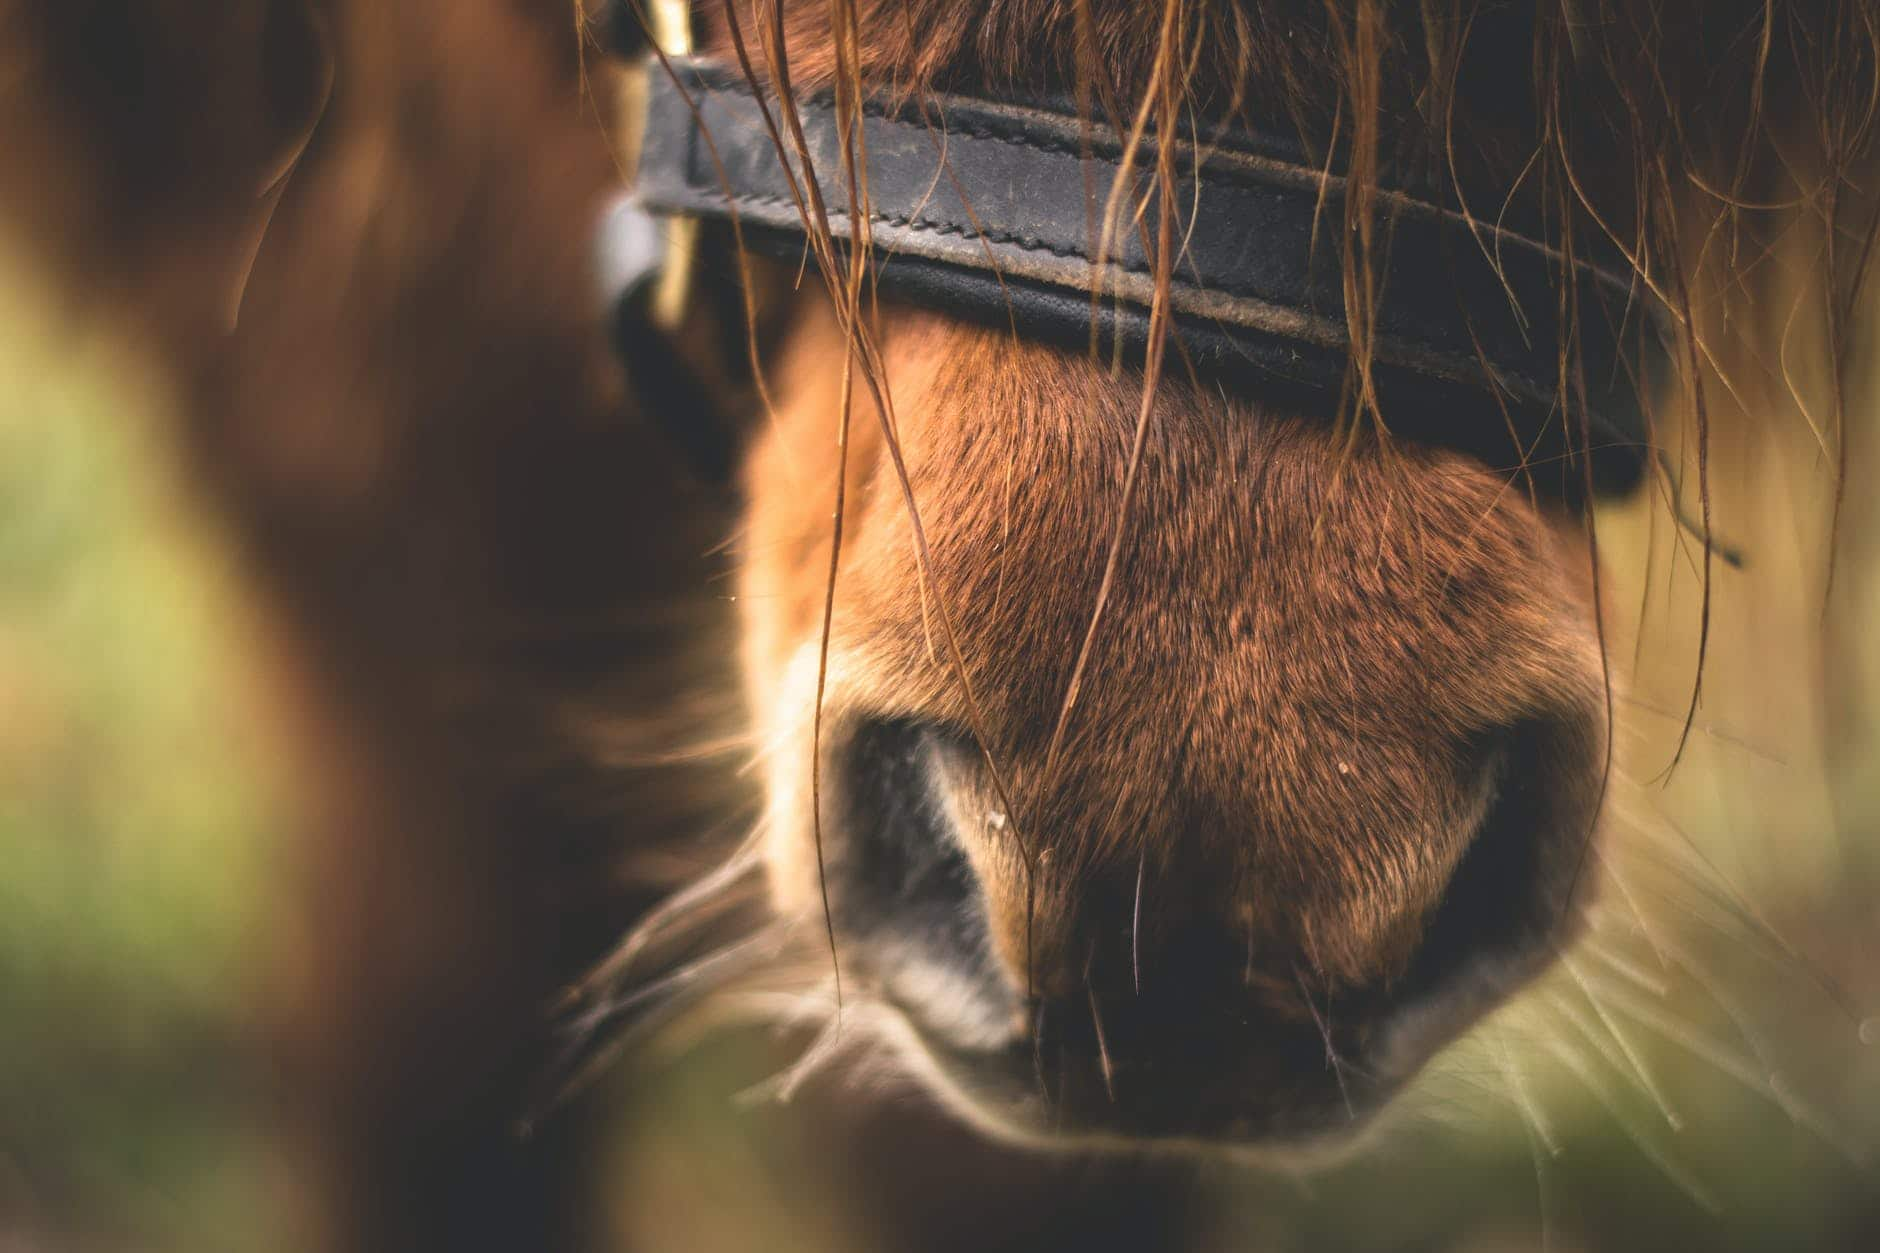 Common allergies in horses